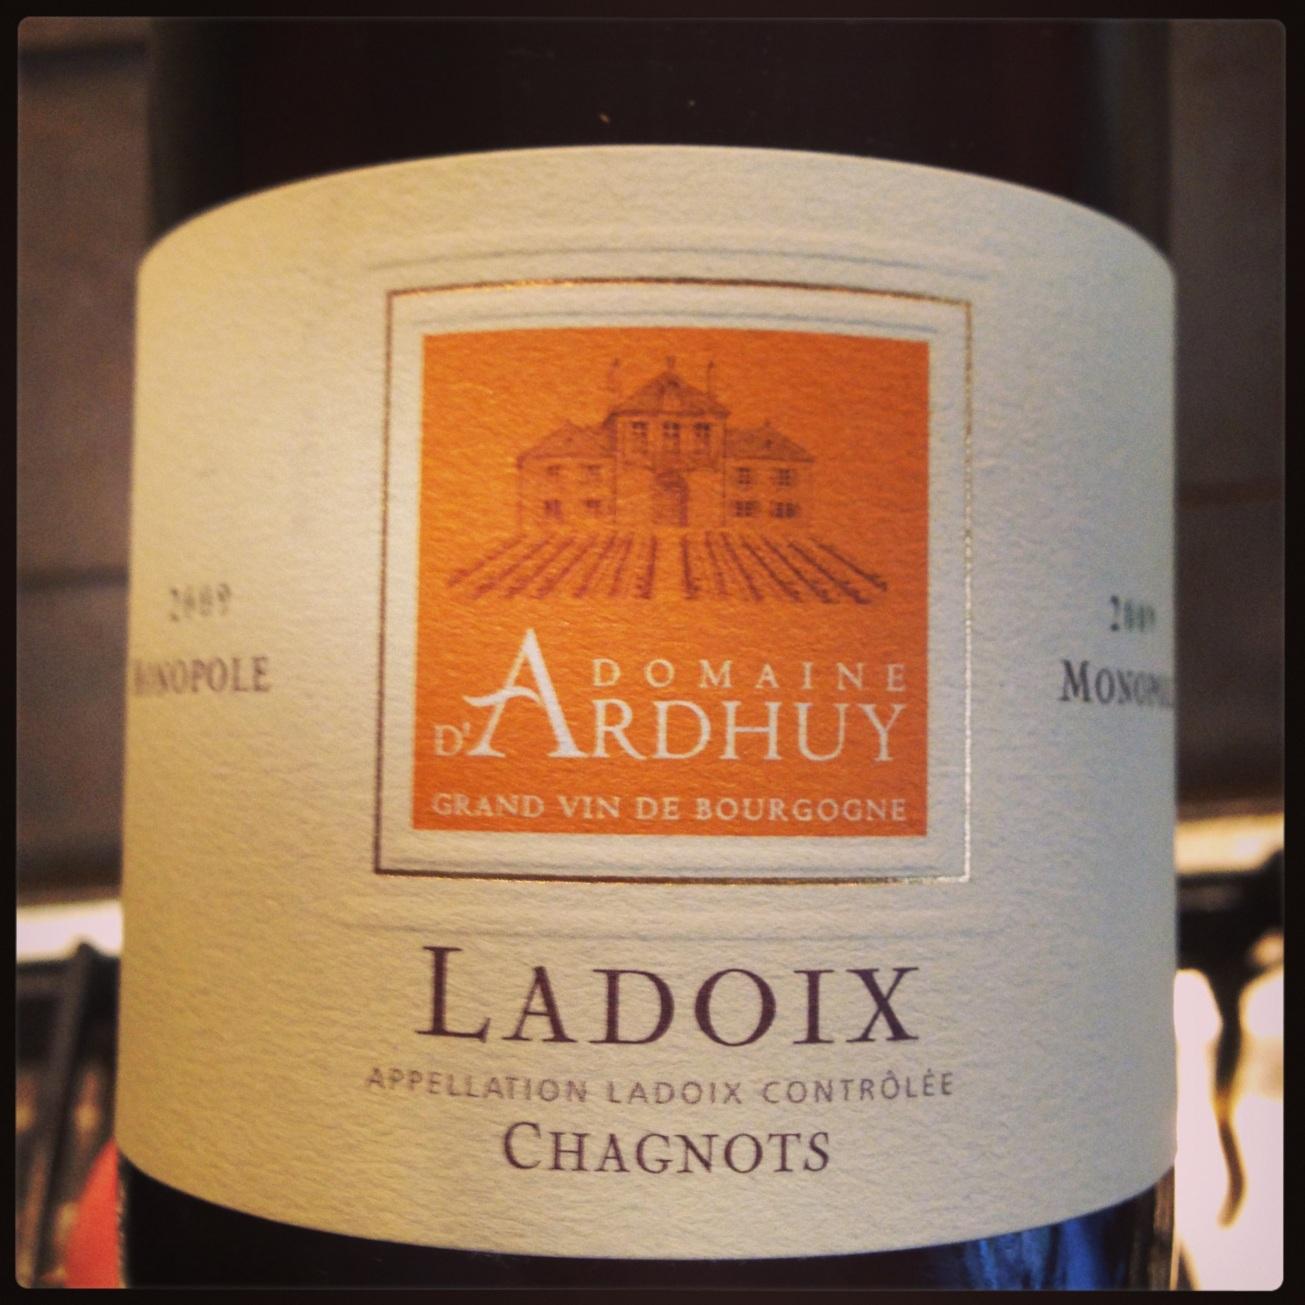 2009 d'Ardhuy Ladoix